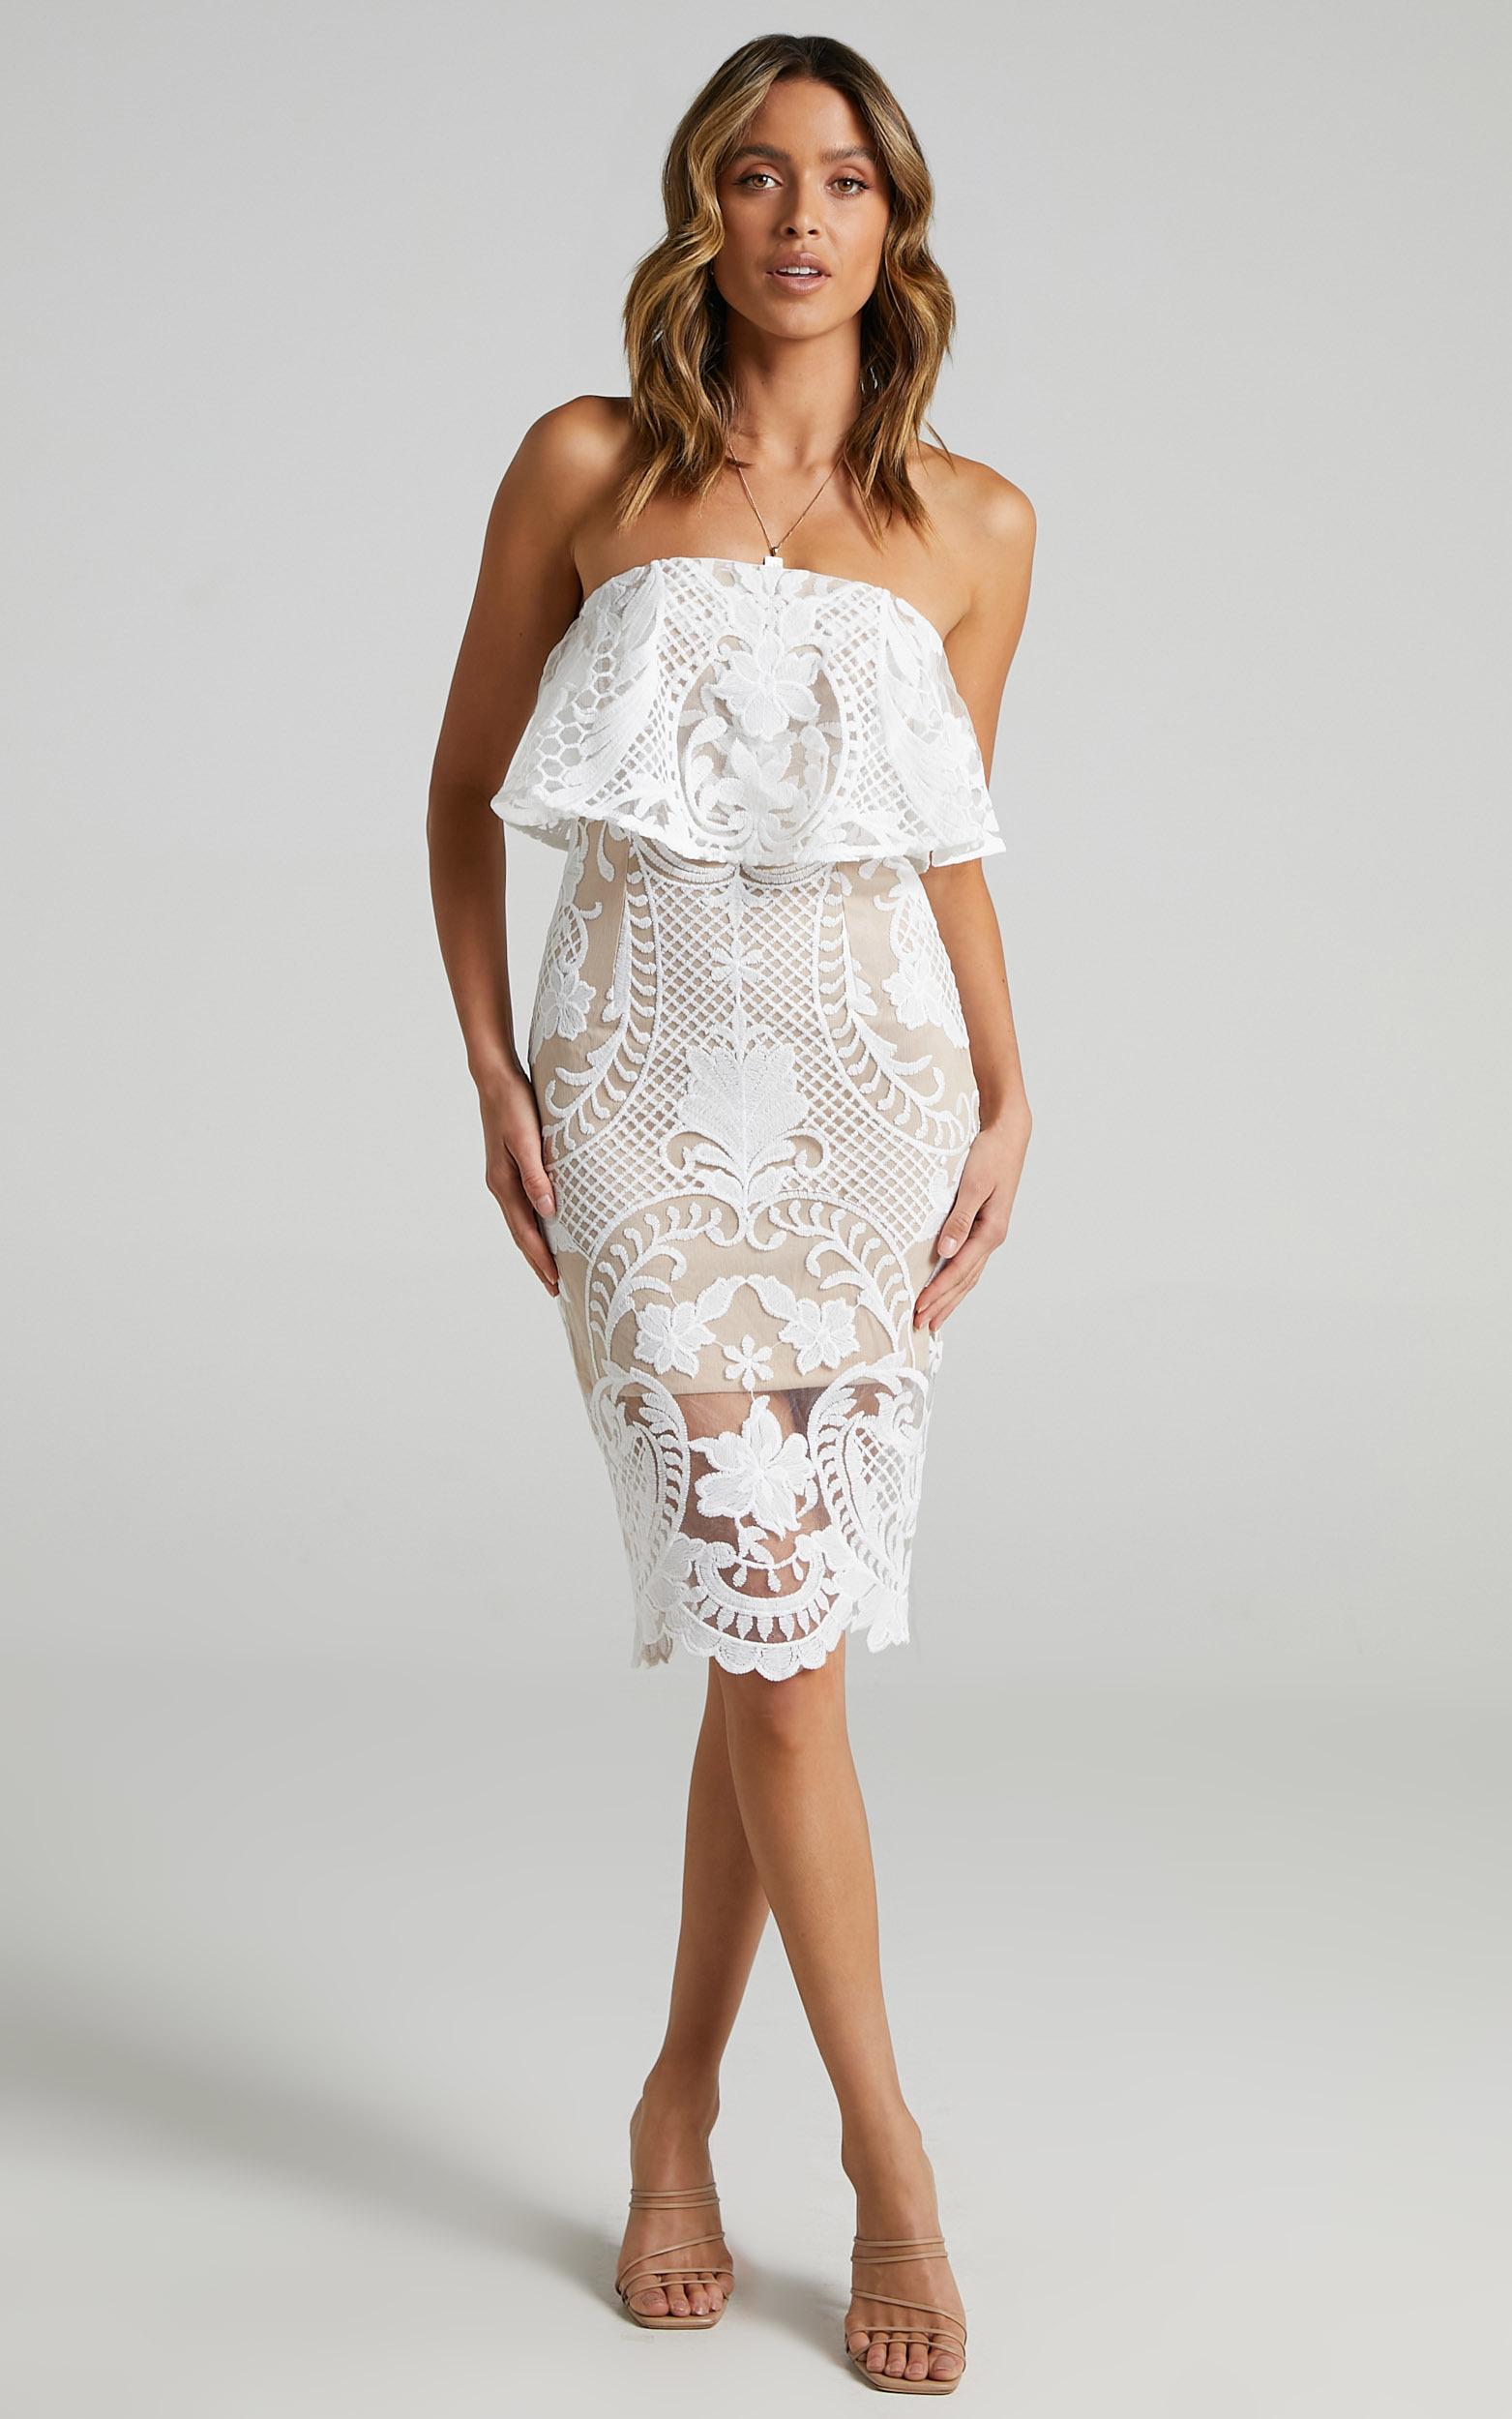 Senorita Dress in White Lace - 06, WHT1, hi-res image number null